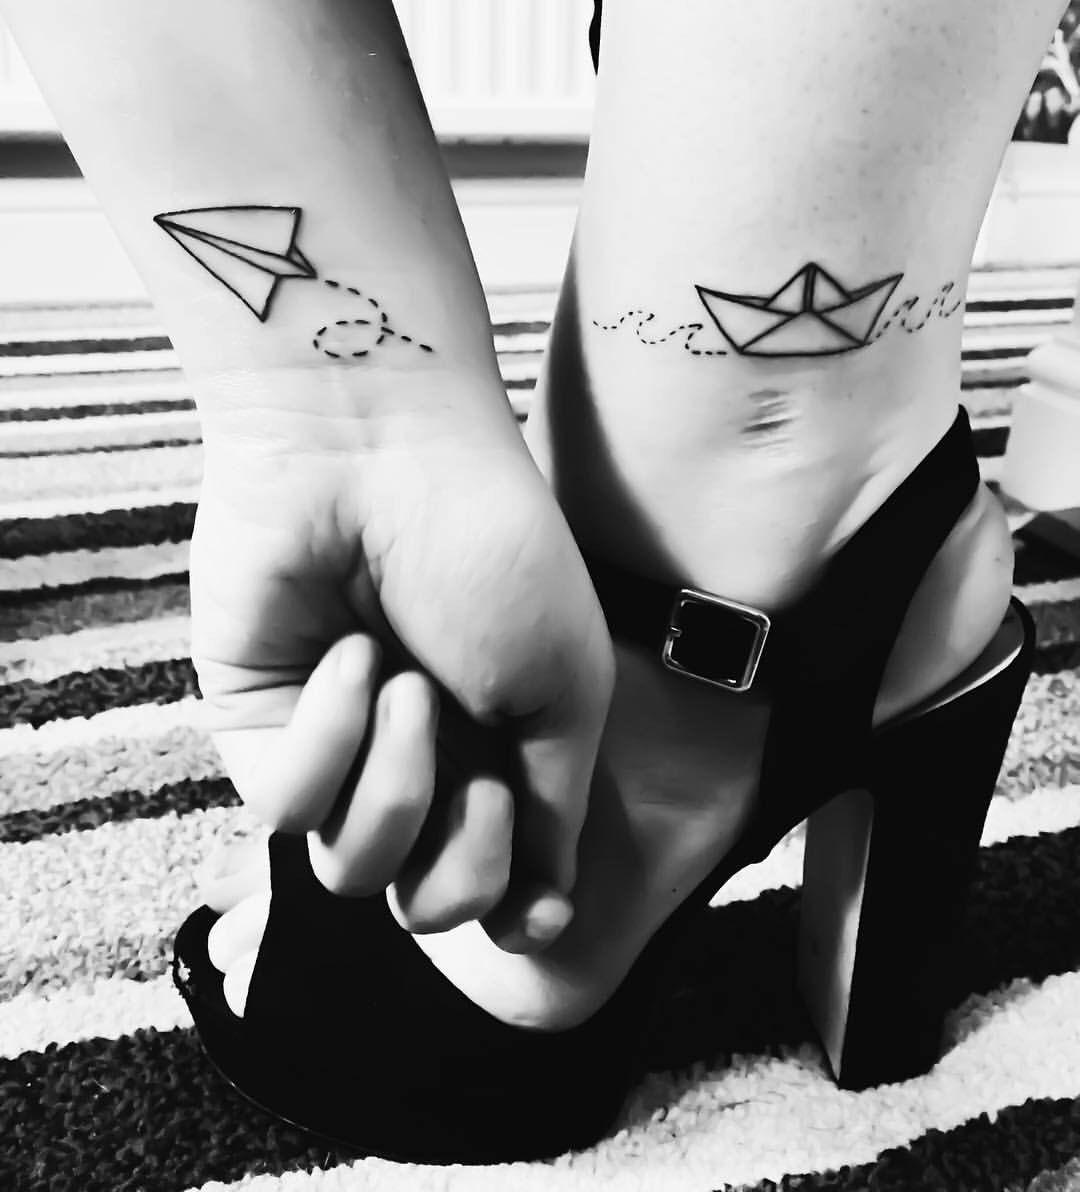 #tattoo #matchingtattoos #paperplane #paperboat #boattattoo #planetattoo